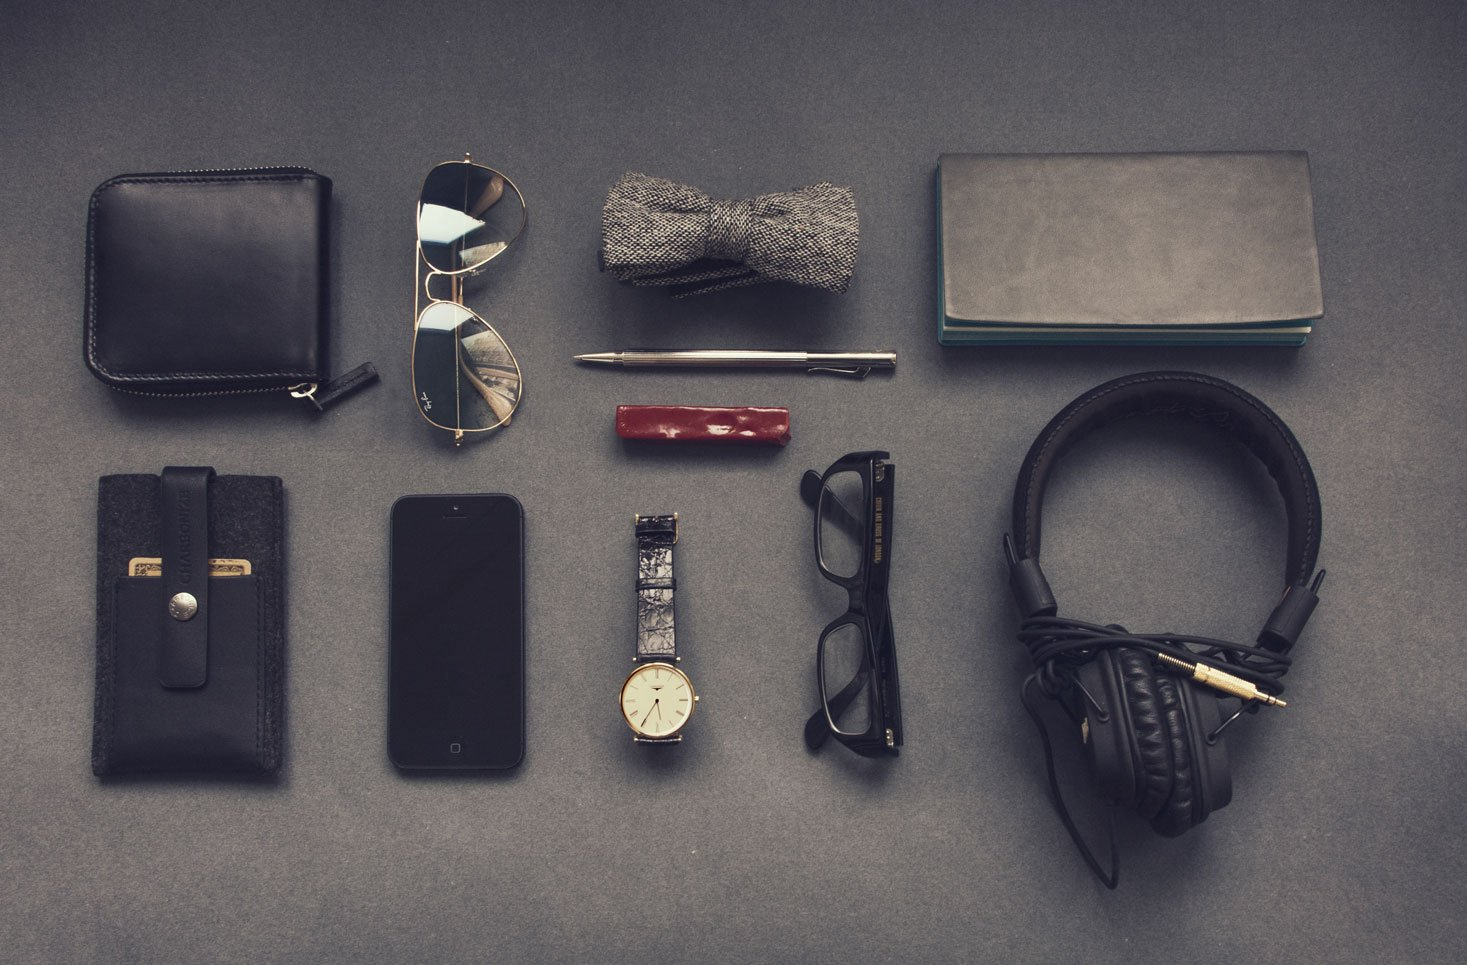 Image outils, portable, casque